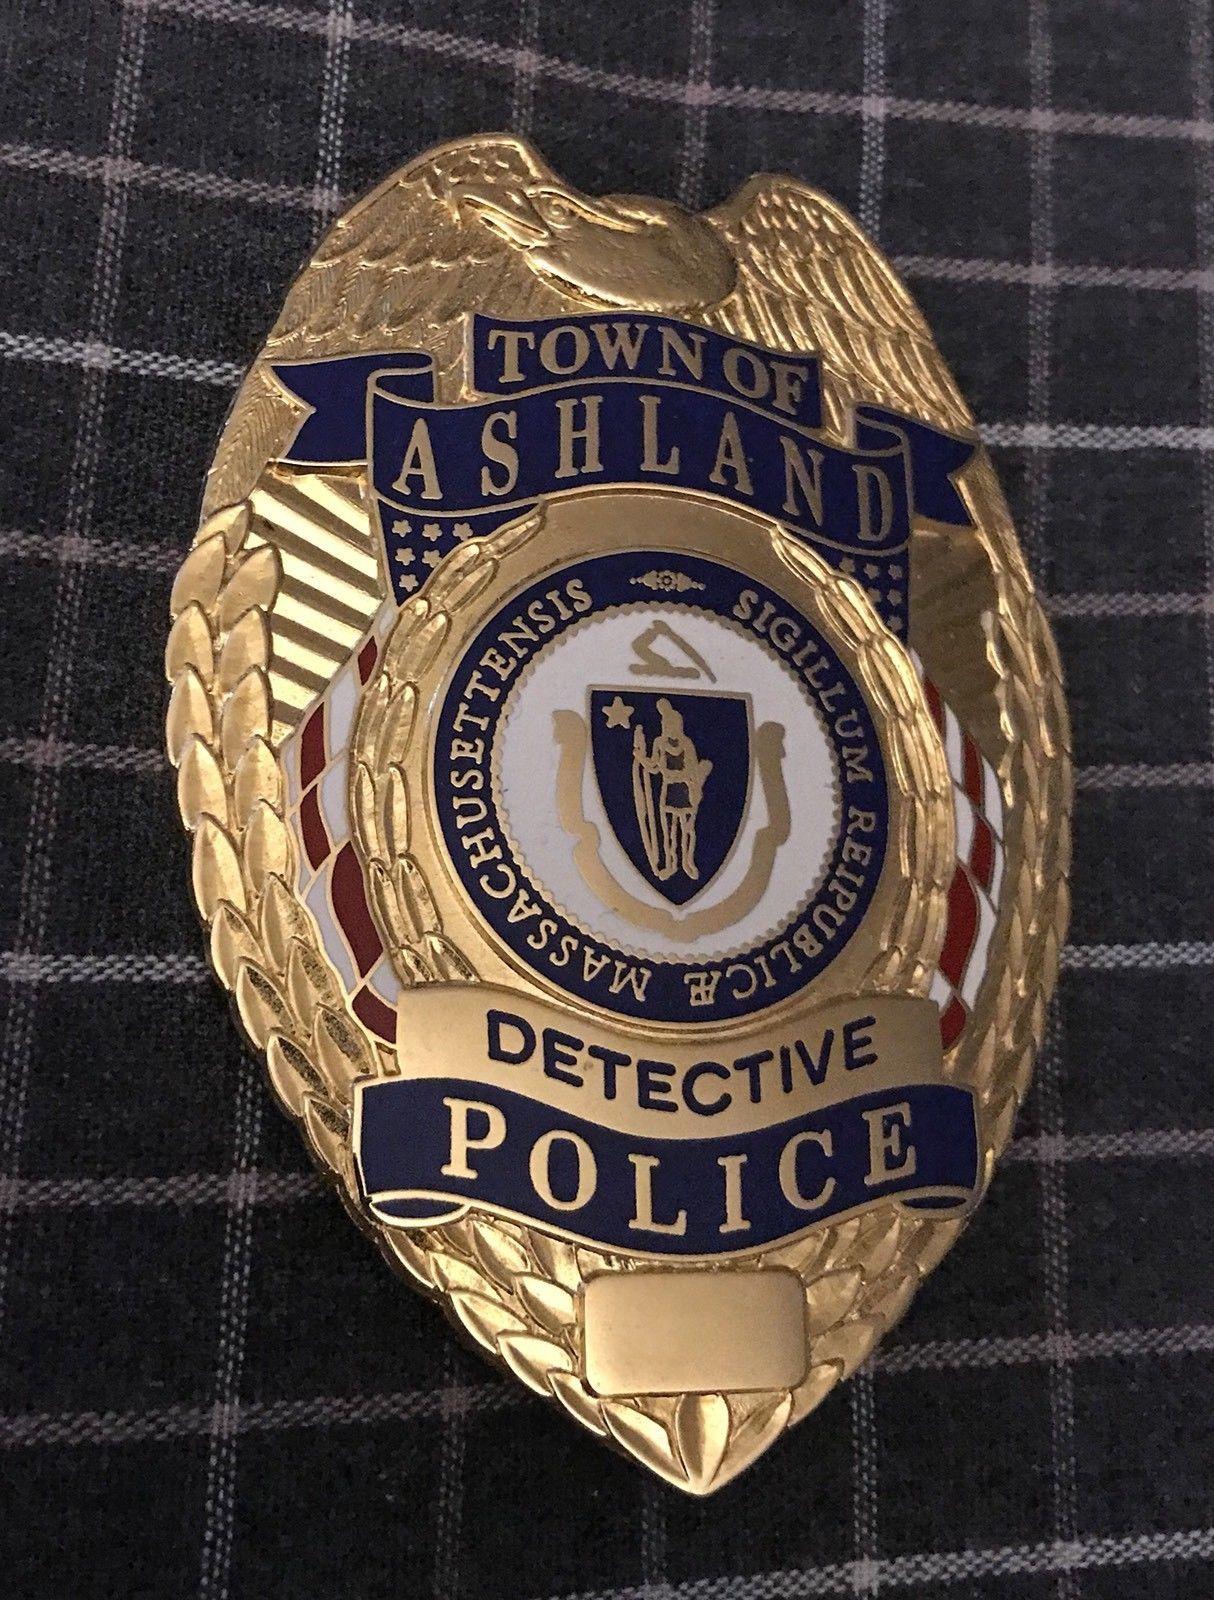 Detective Town Of Ashland Police G R Davis Police Badge Police Detective Police